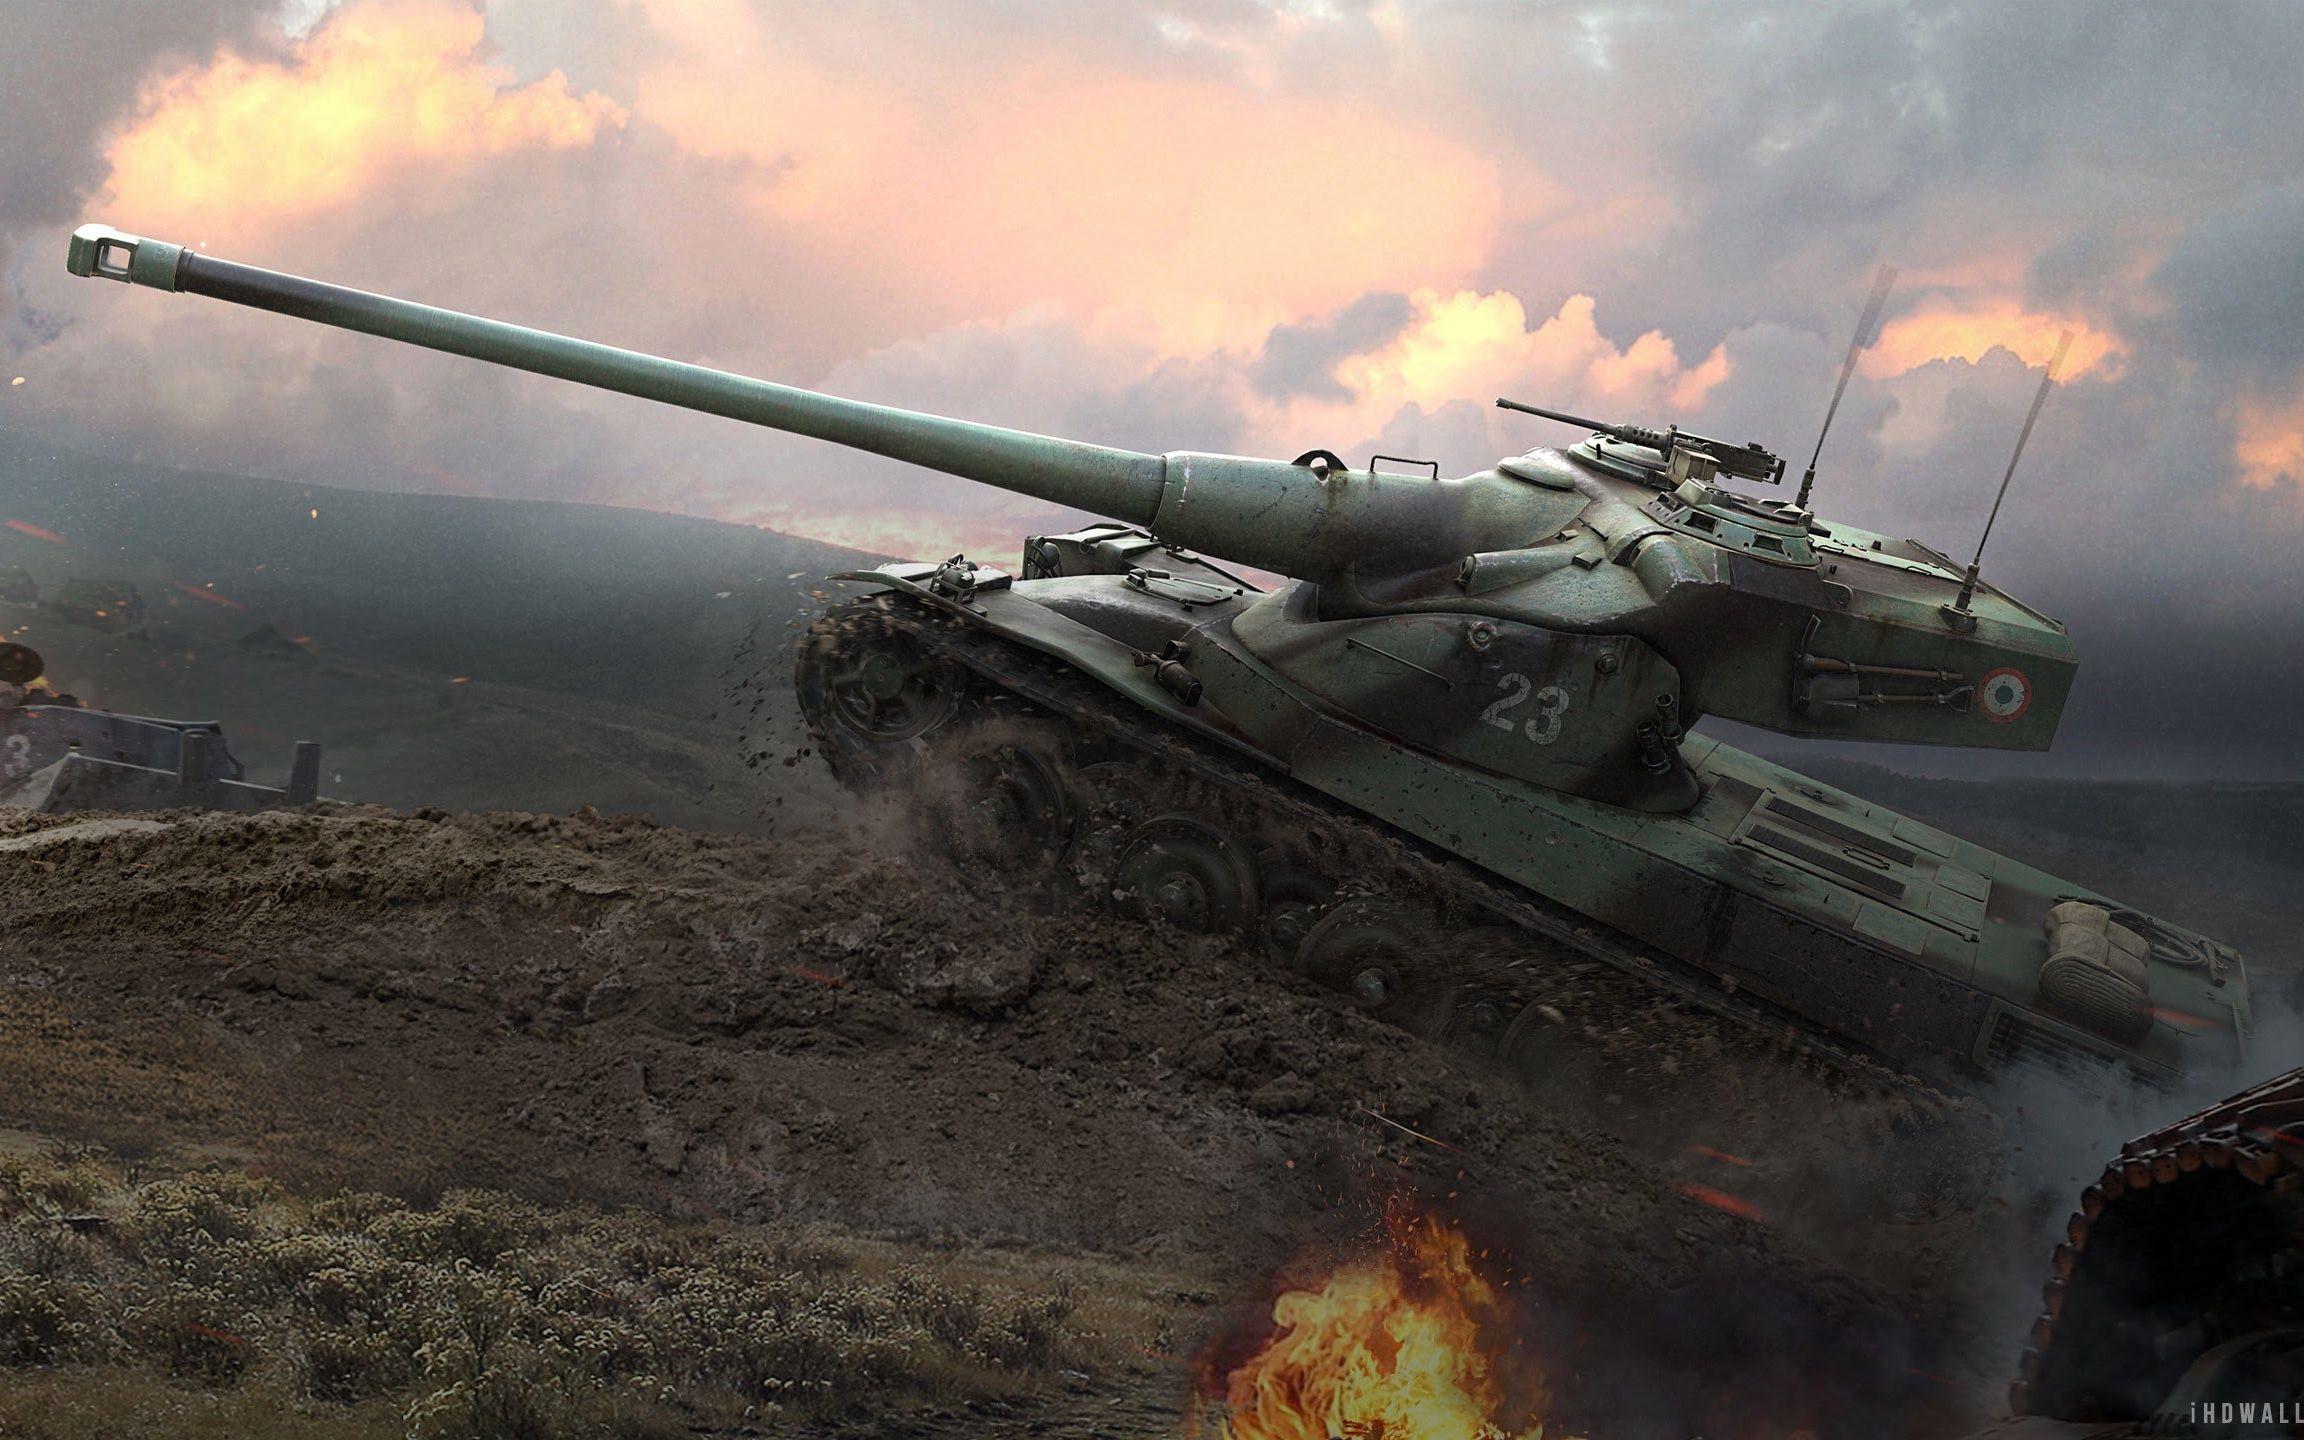 t110e5坦克_wotb坦克世界闪击战t110e5 为什么叫高达